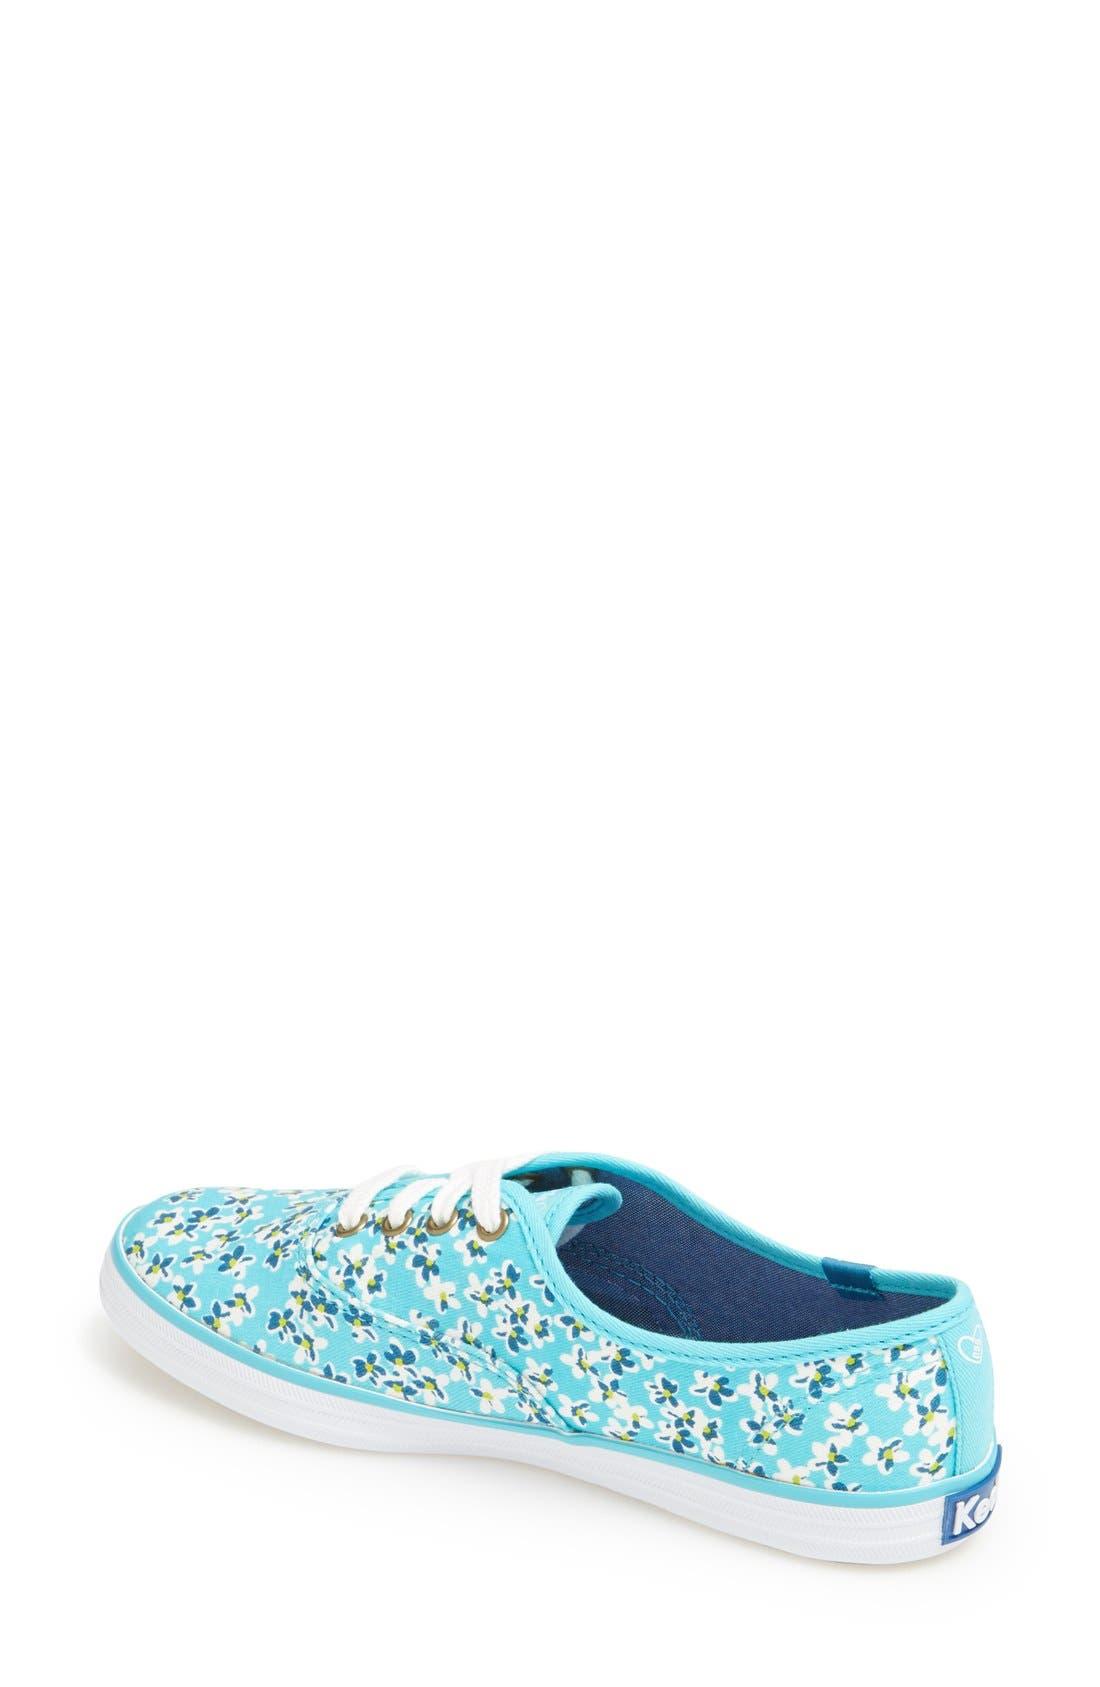 Alternate Image 2  - Keds® Taylor Swift 'Champion Sunpie Floral' Sneaker (Women)